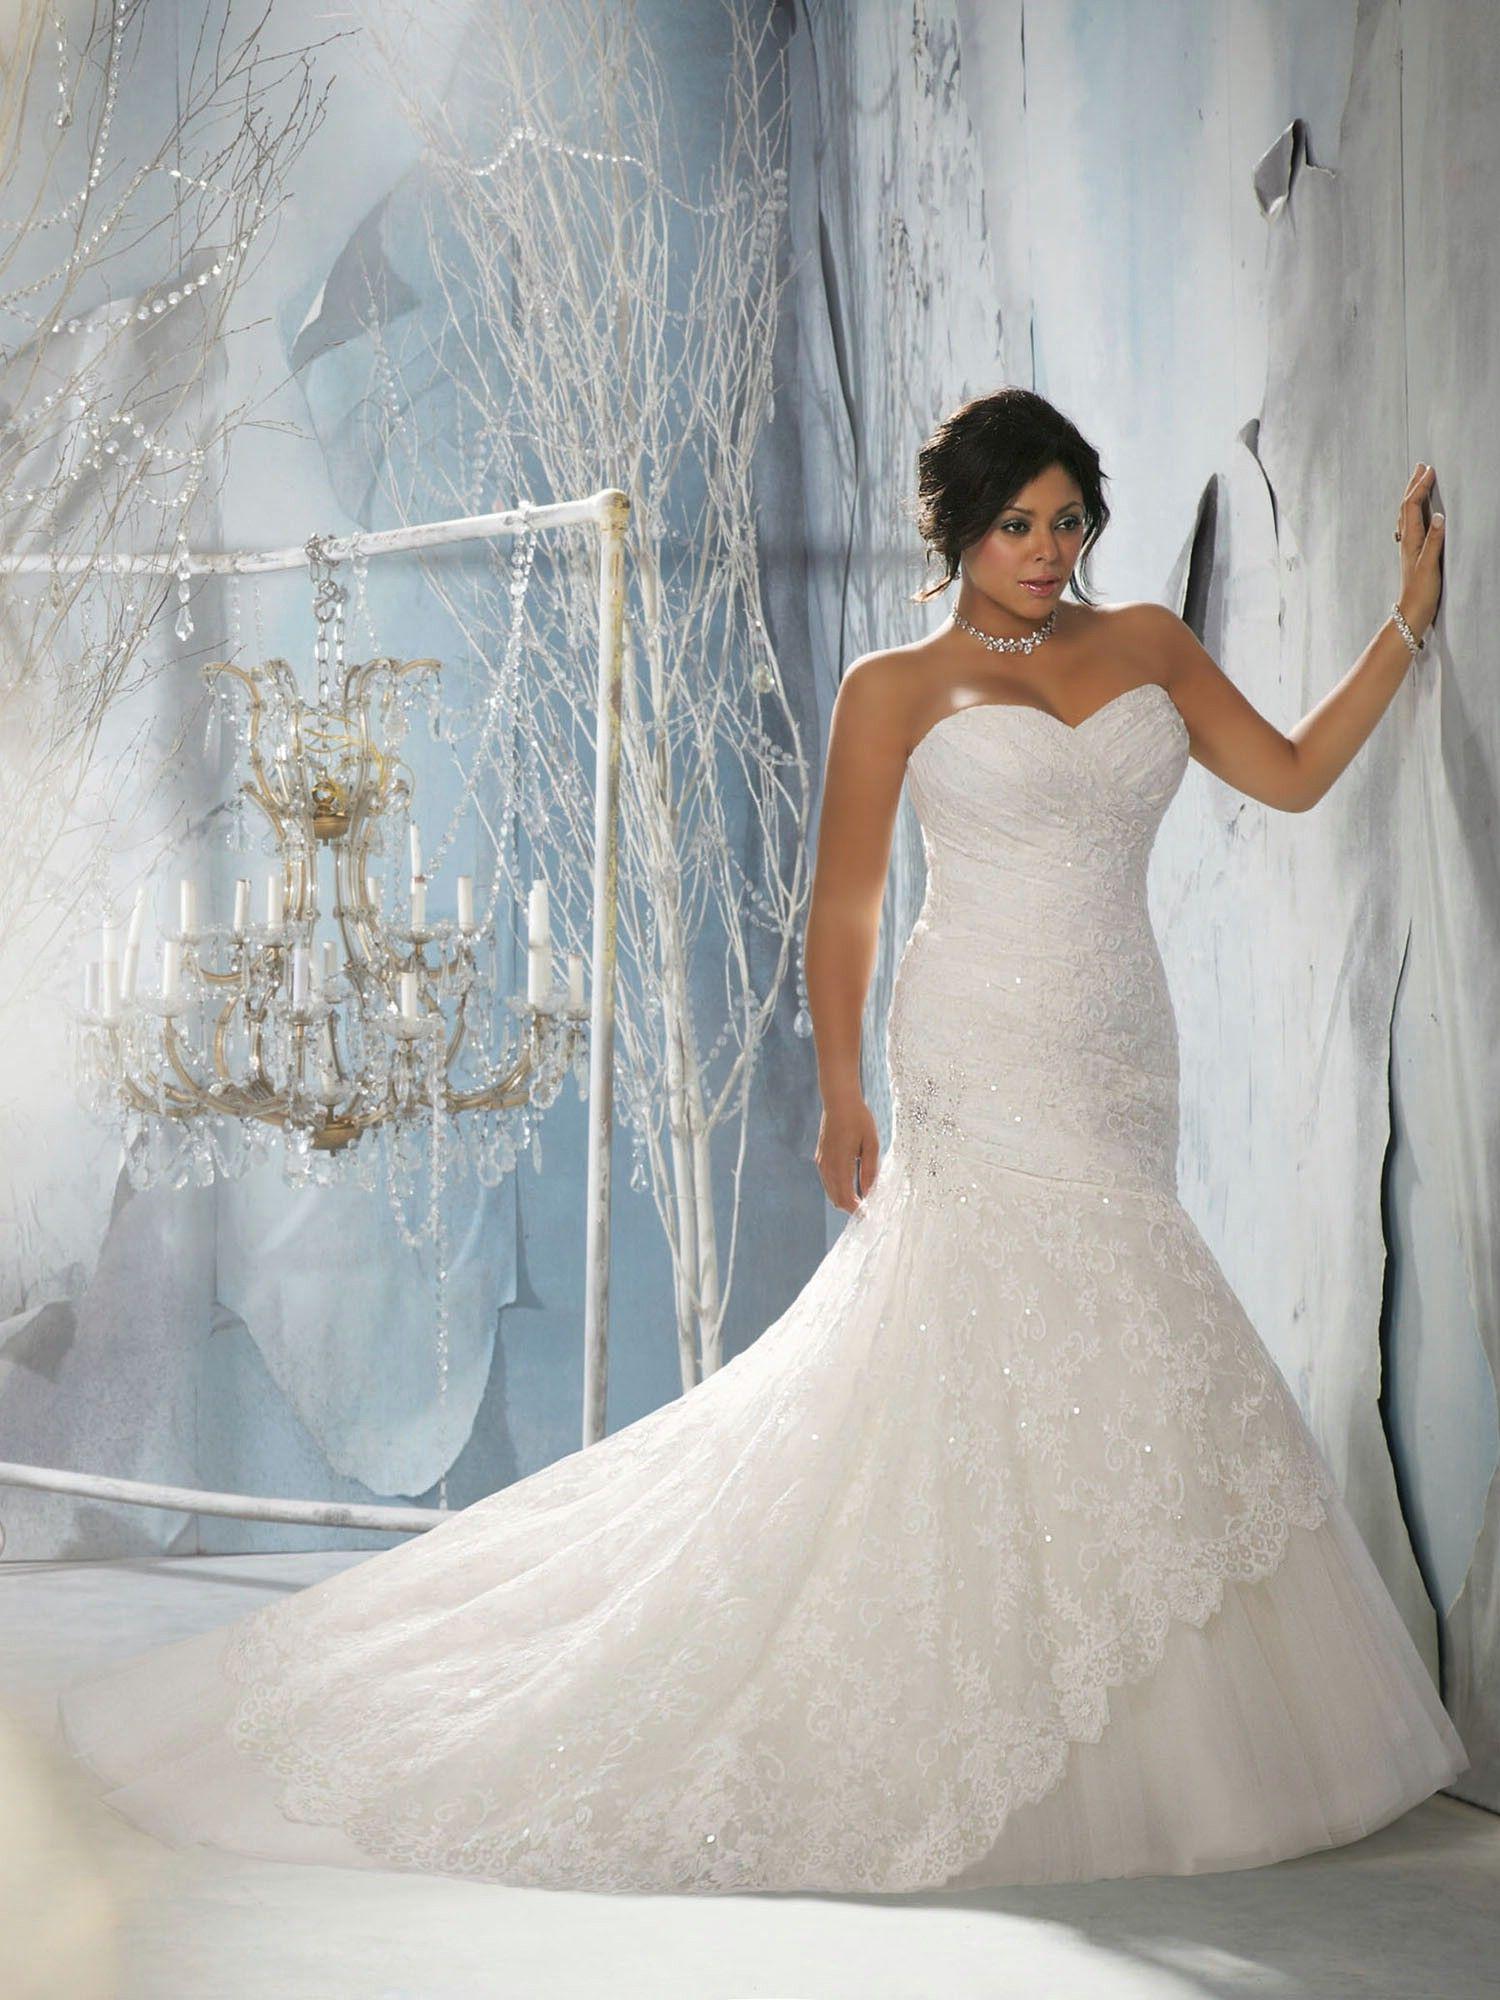 Amazing Mori Lee Wedding Dresses Gallery - All Wedding Dresses ...